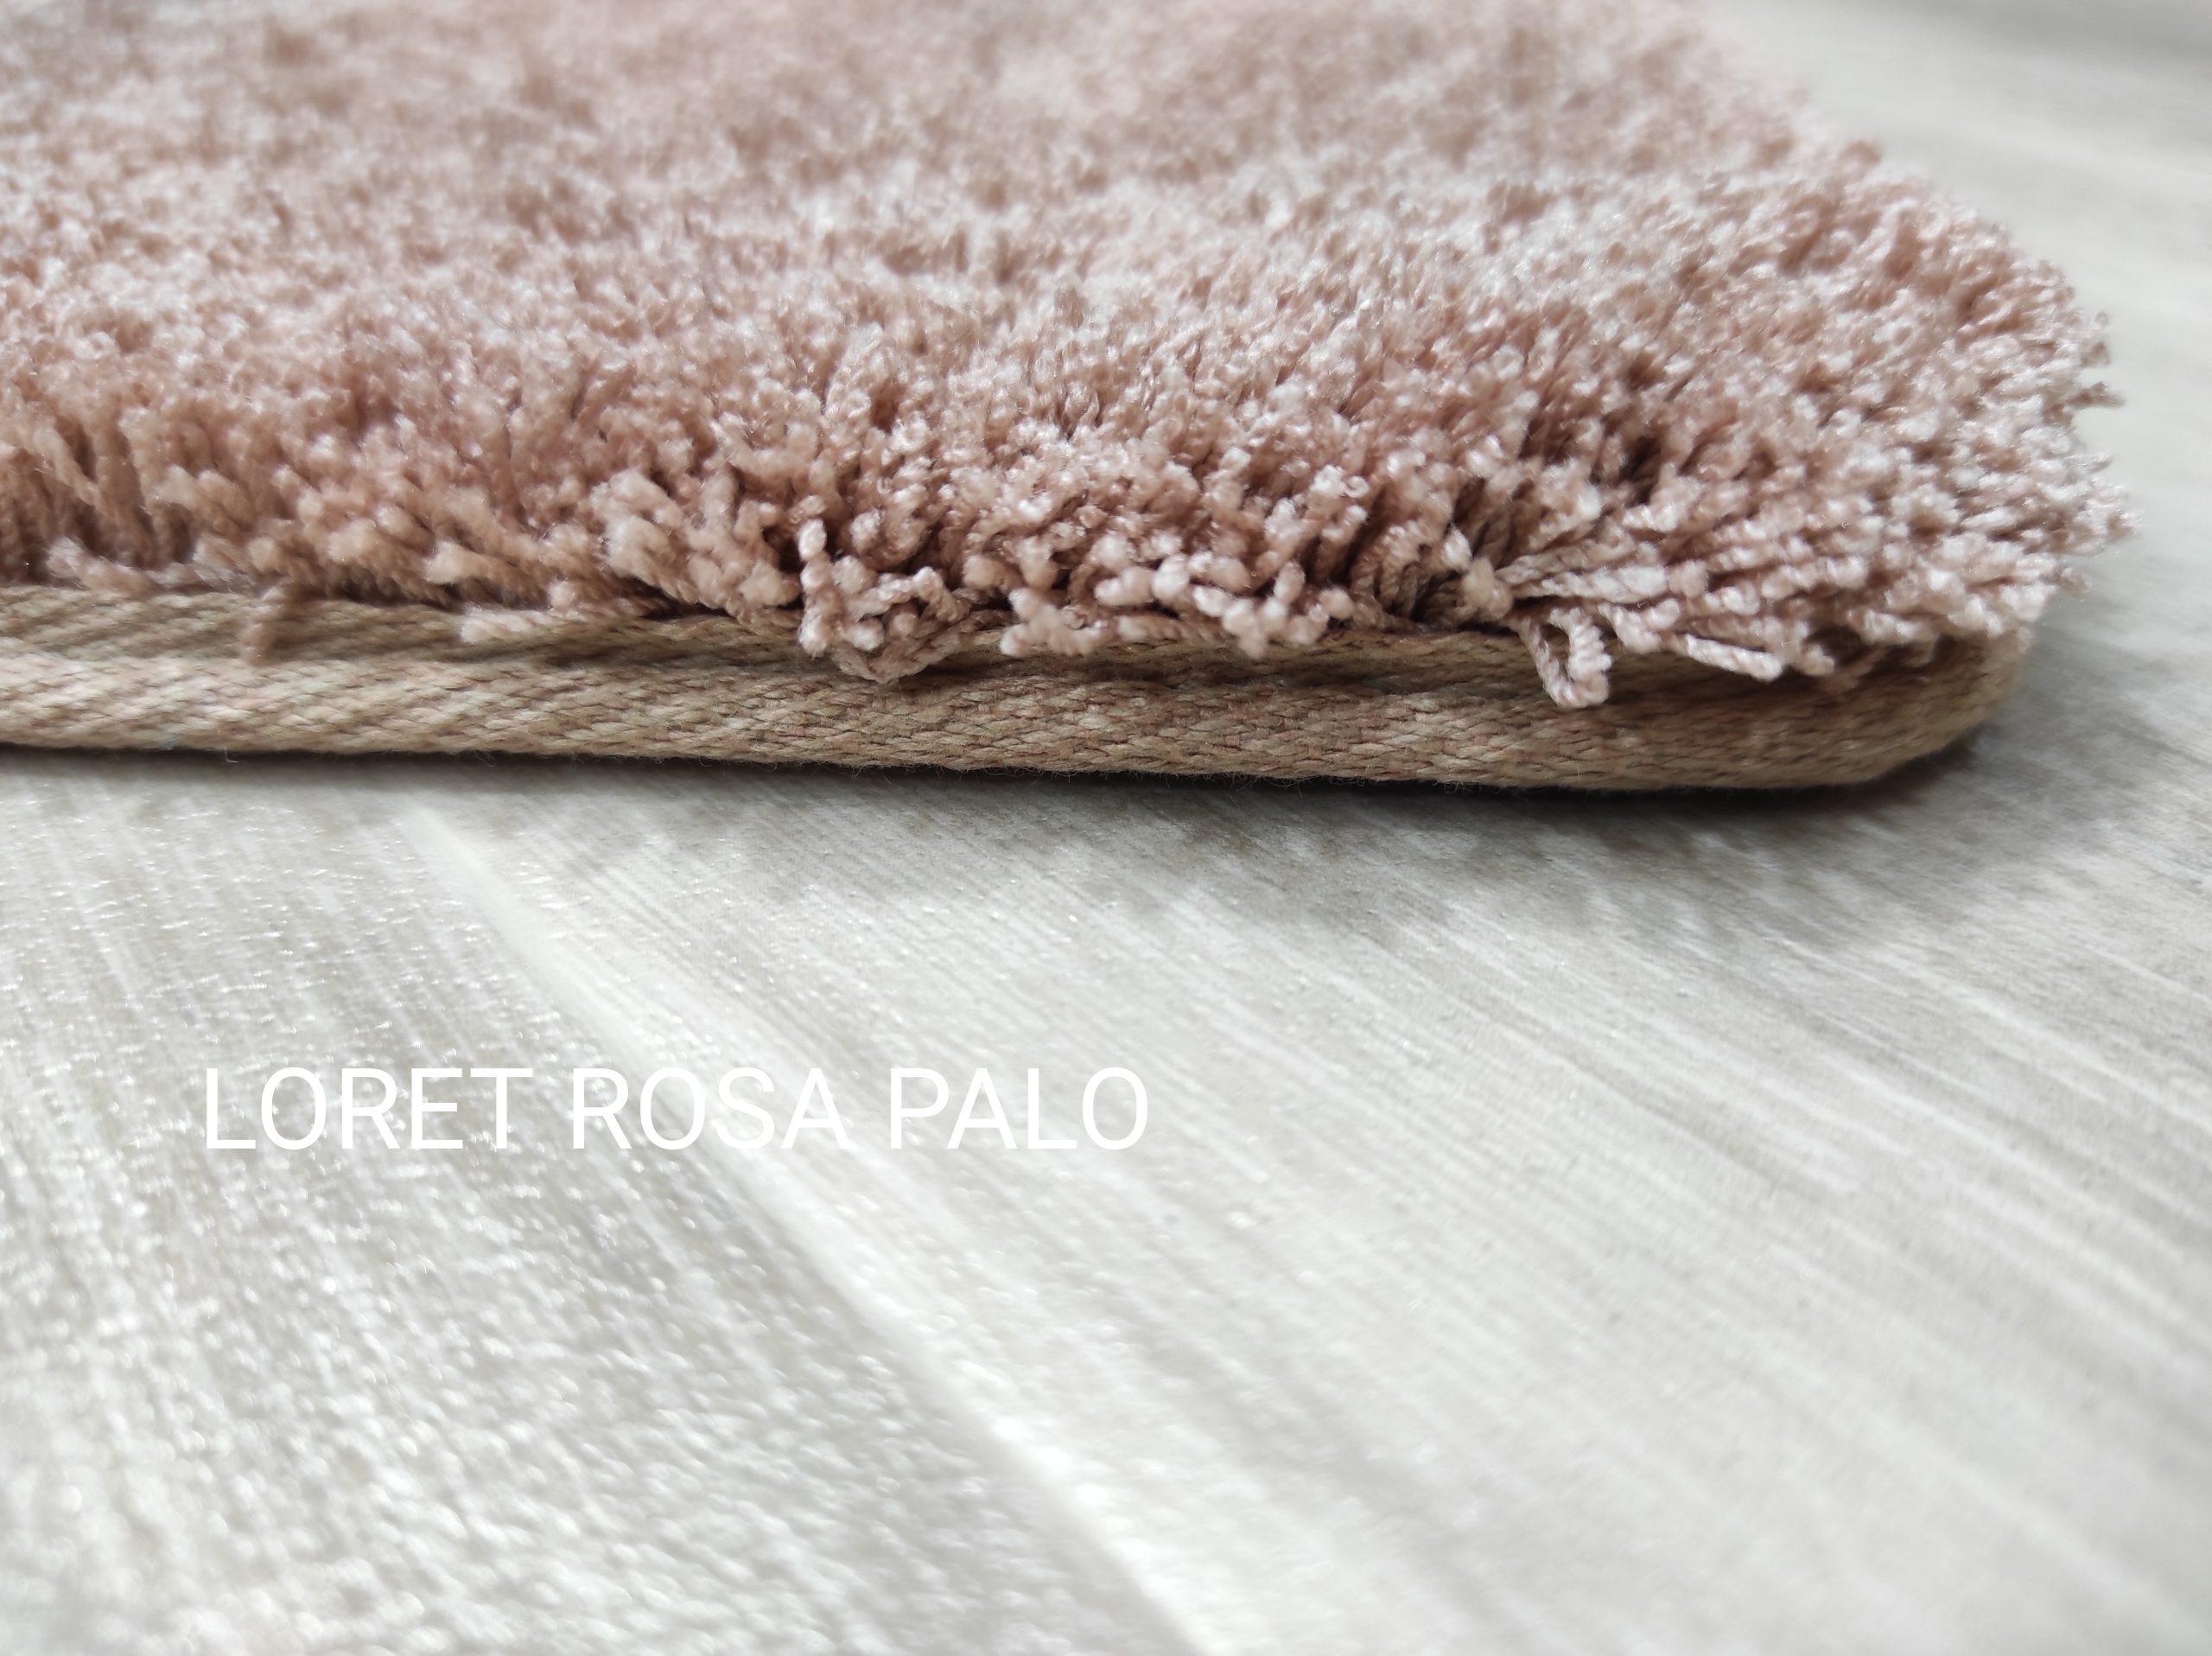 Loret rosa Palo